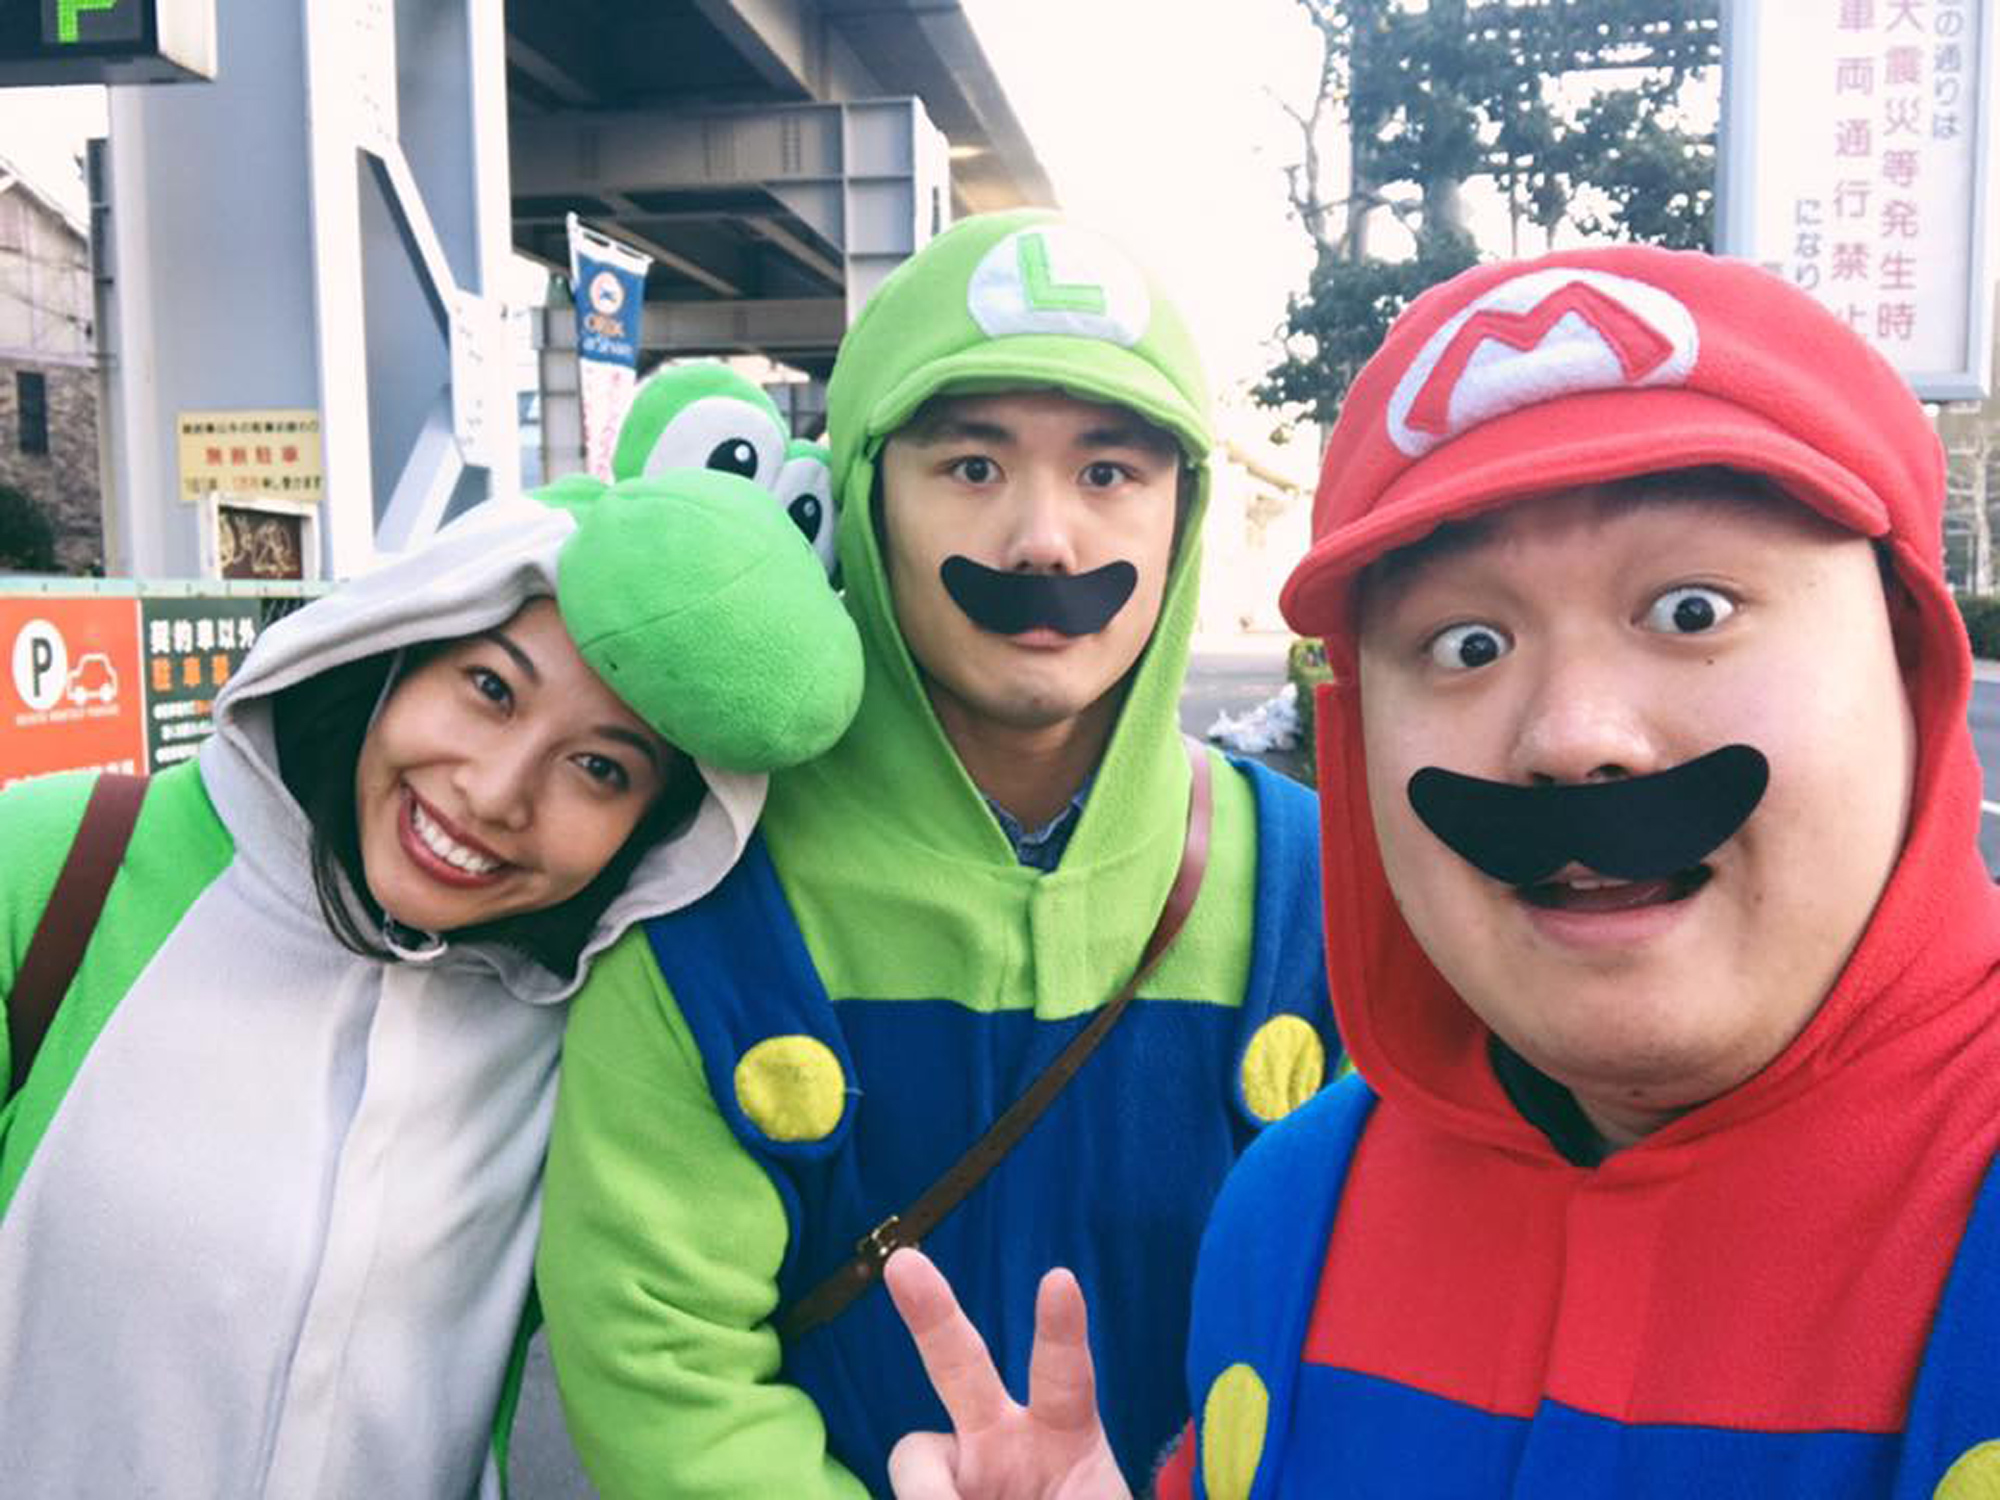 004-Mario.jpg